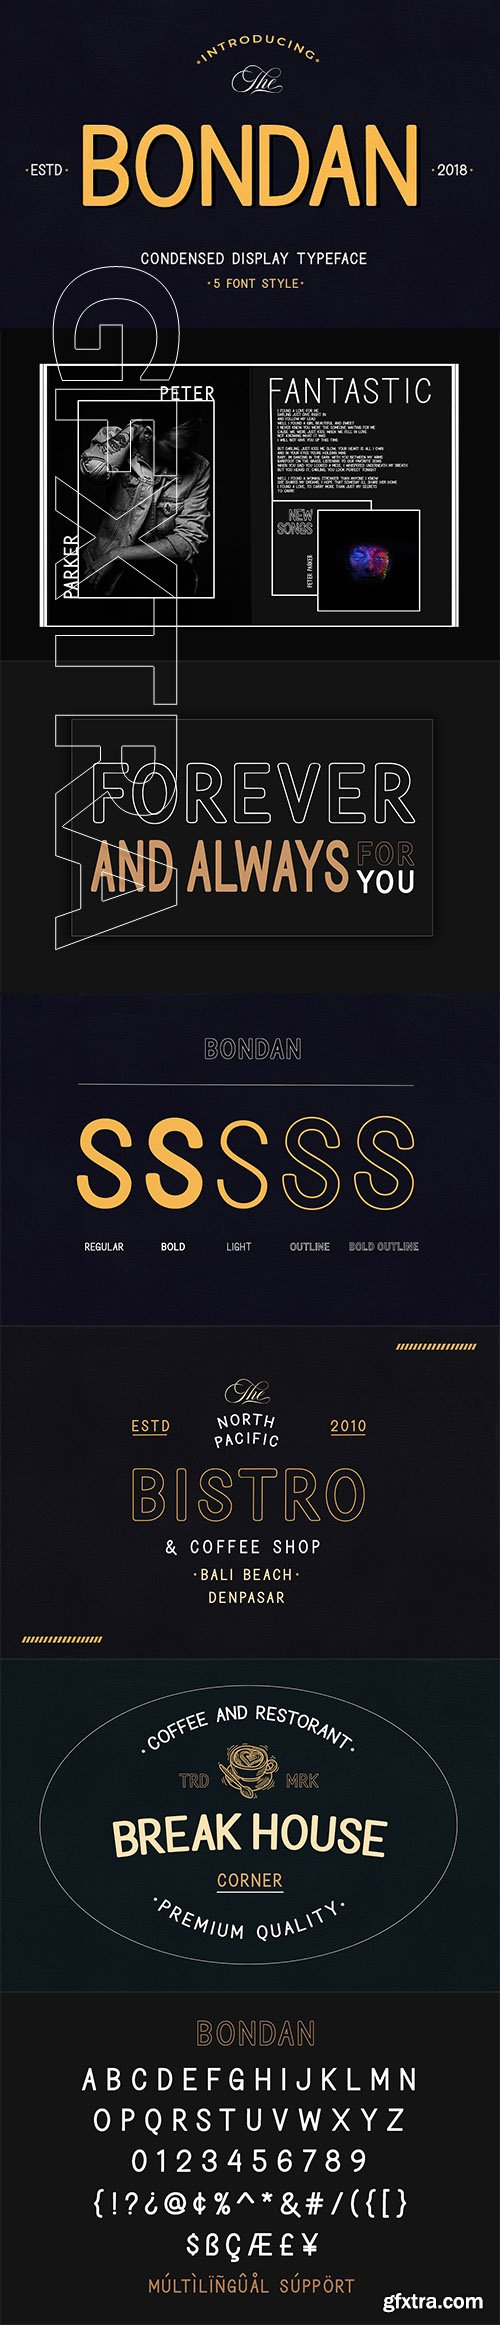 CreativeMarket - Bondan Typeface 3103631